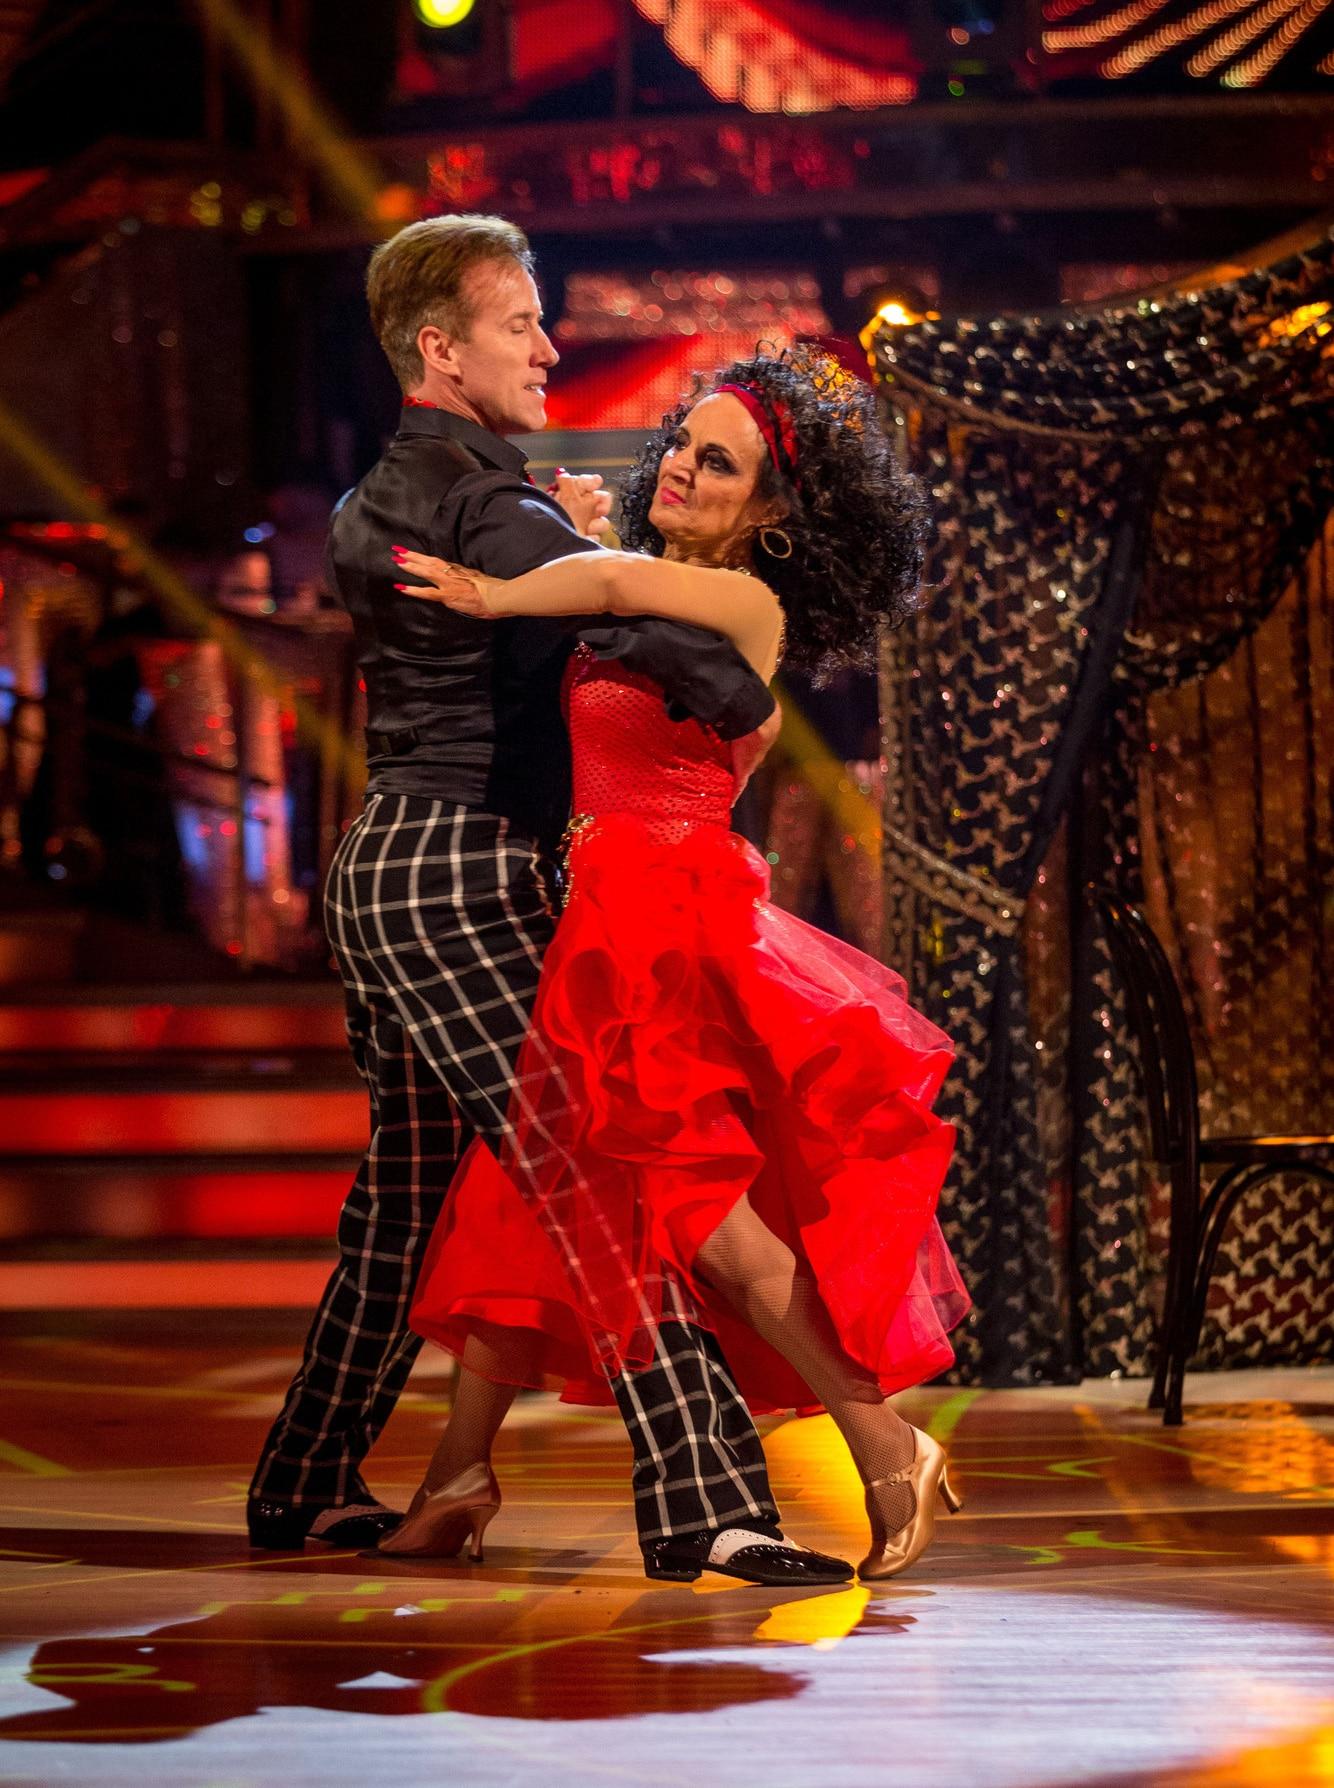 Anton Du Beke & Lesley Joseph dance the Tango